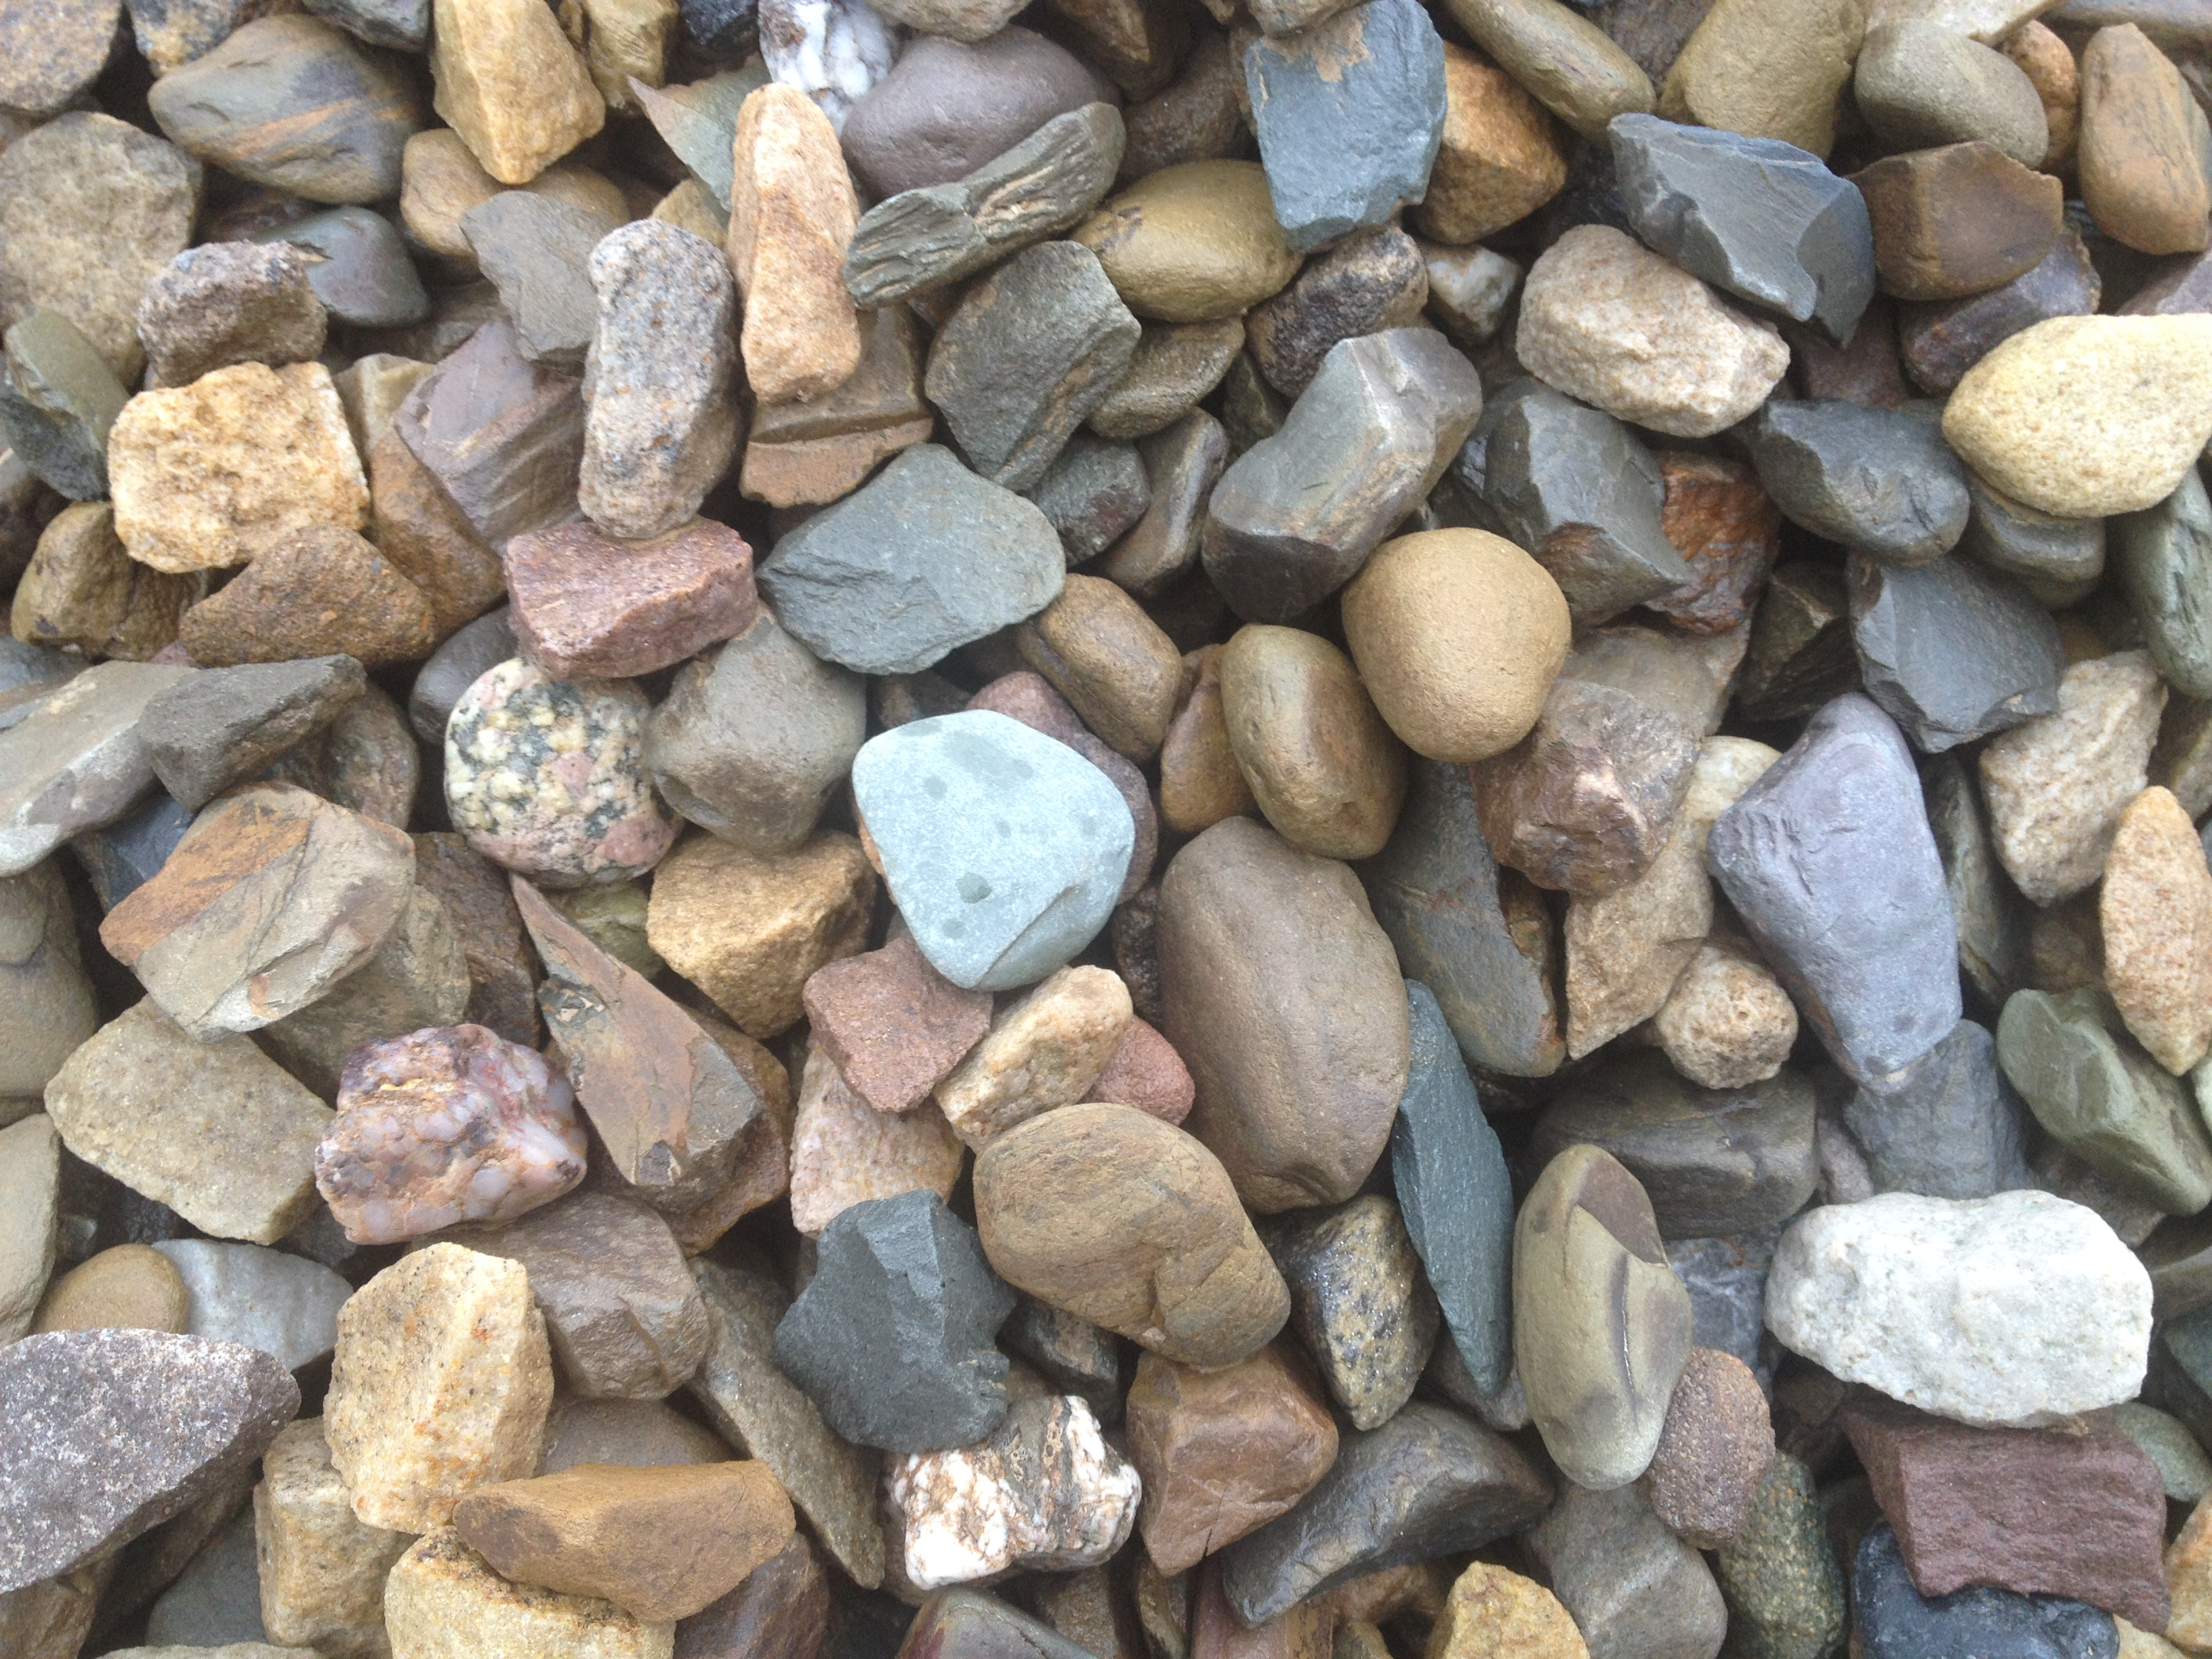 Wexford Sea Pebble 20mm Decorative Stones Gravel And Aggregates Stonedirect Ie